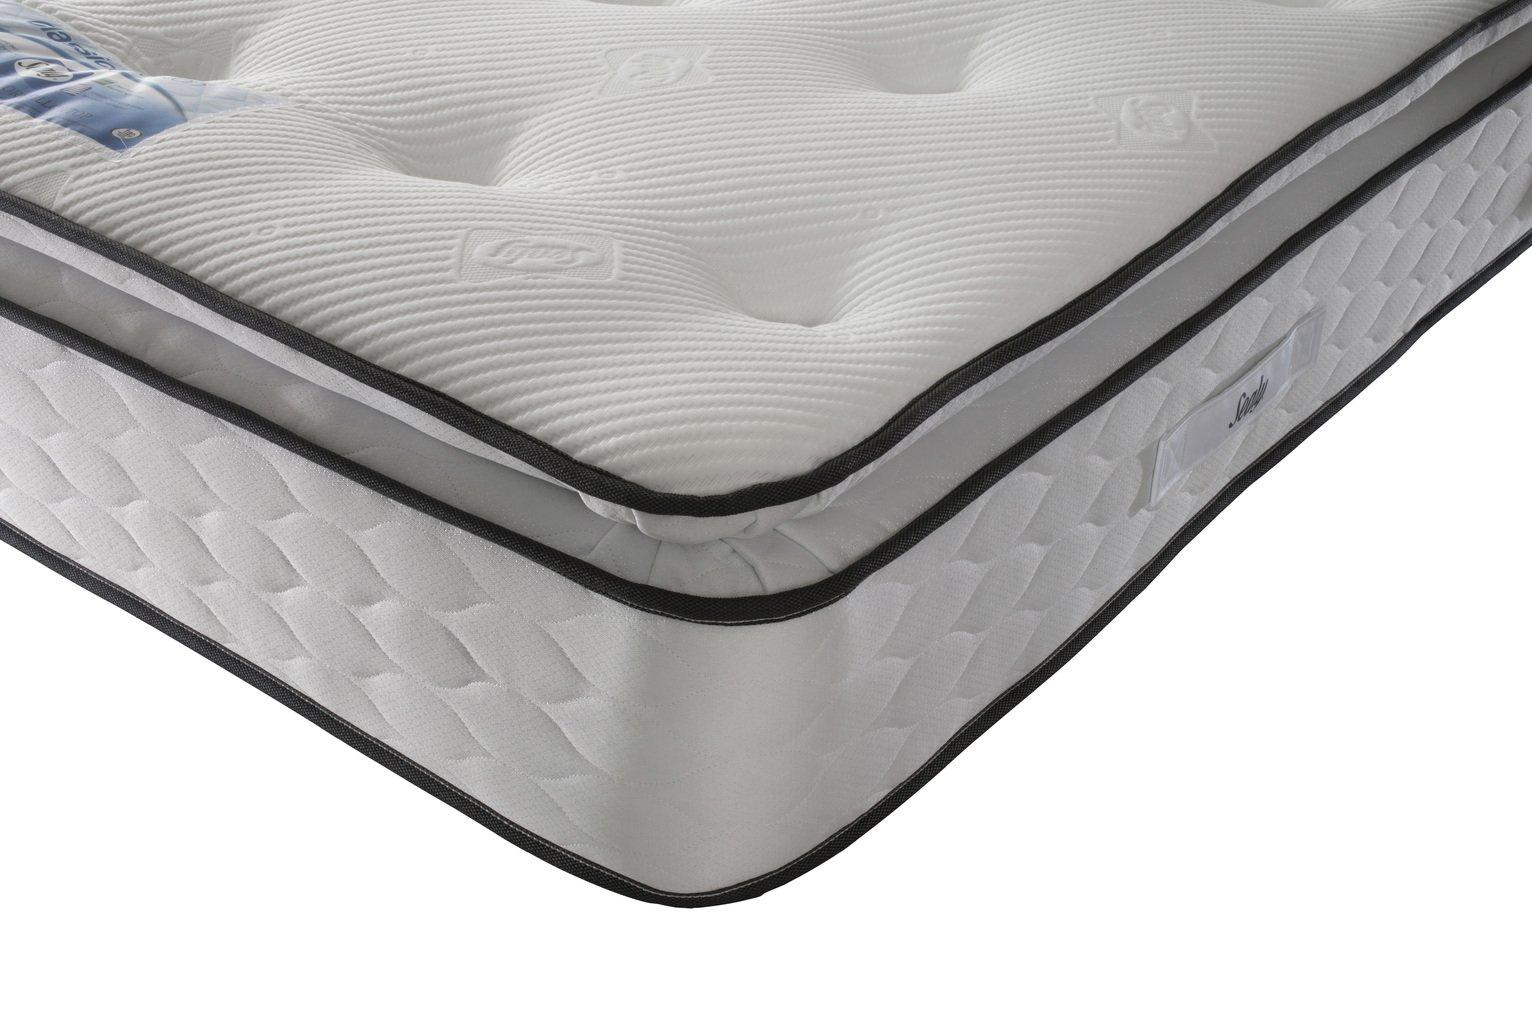 sealy pocket sprung memory pillowtop double mattress